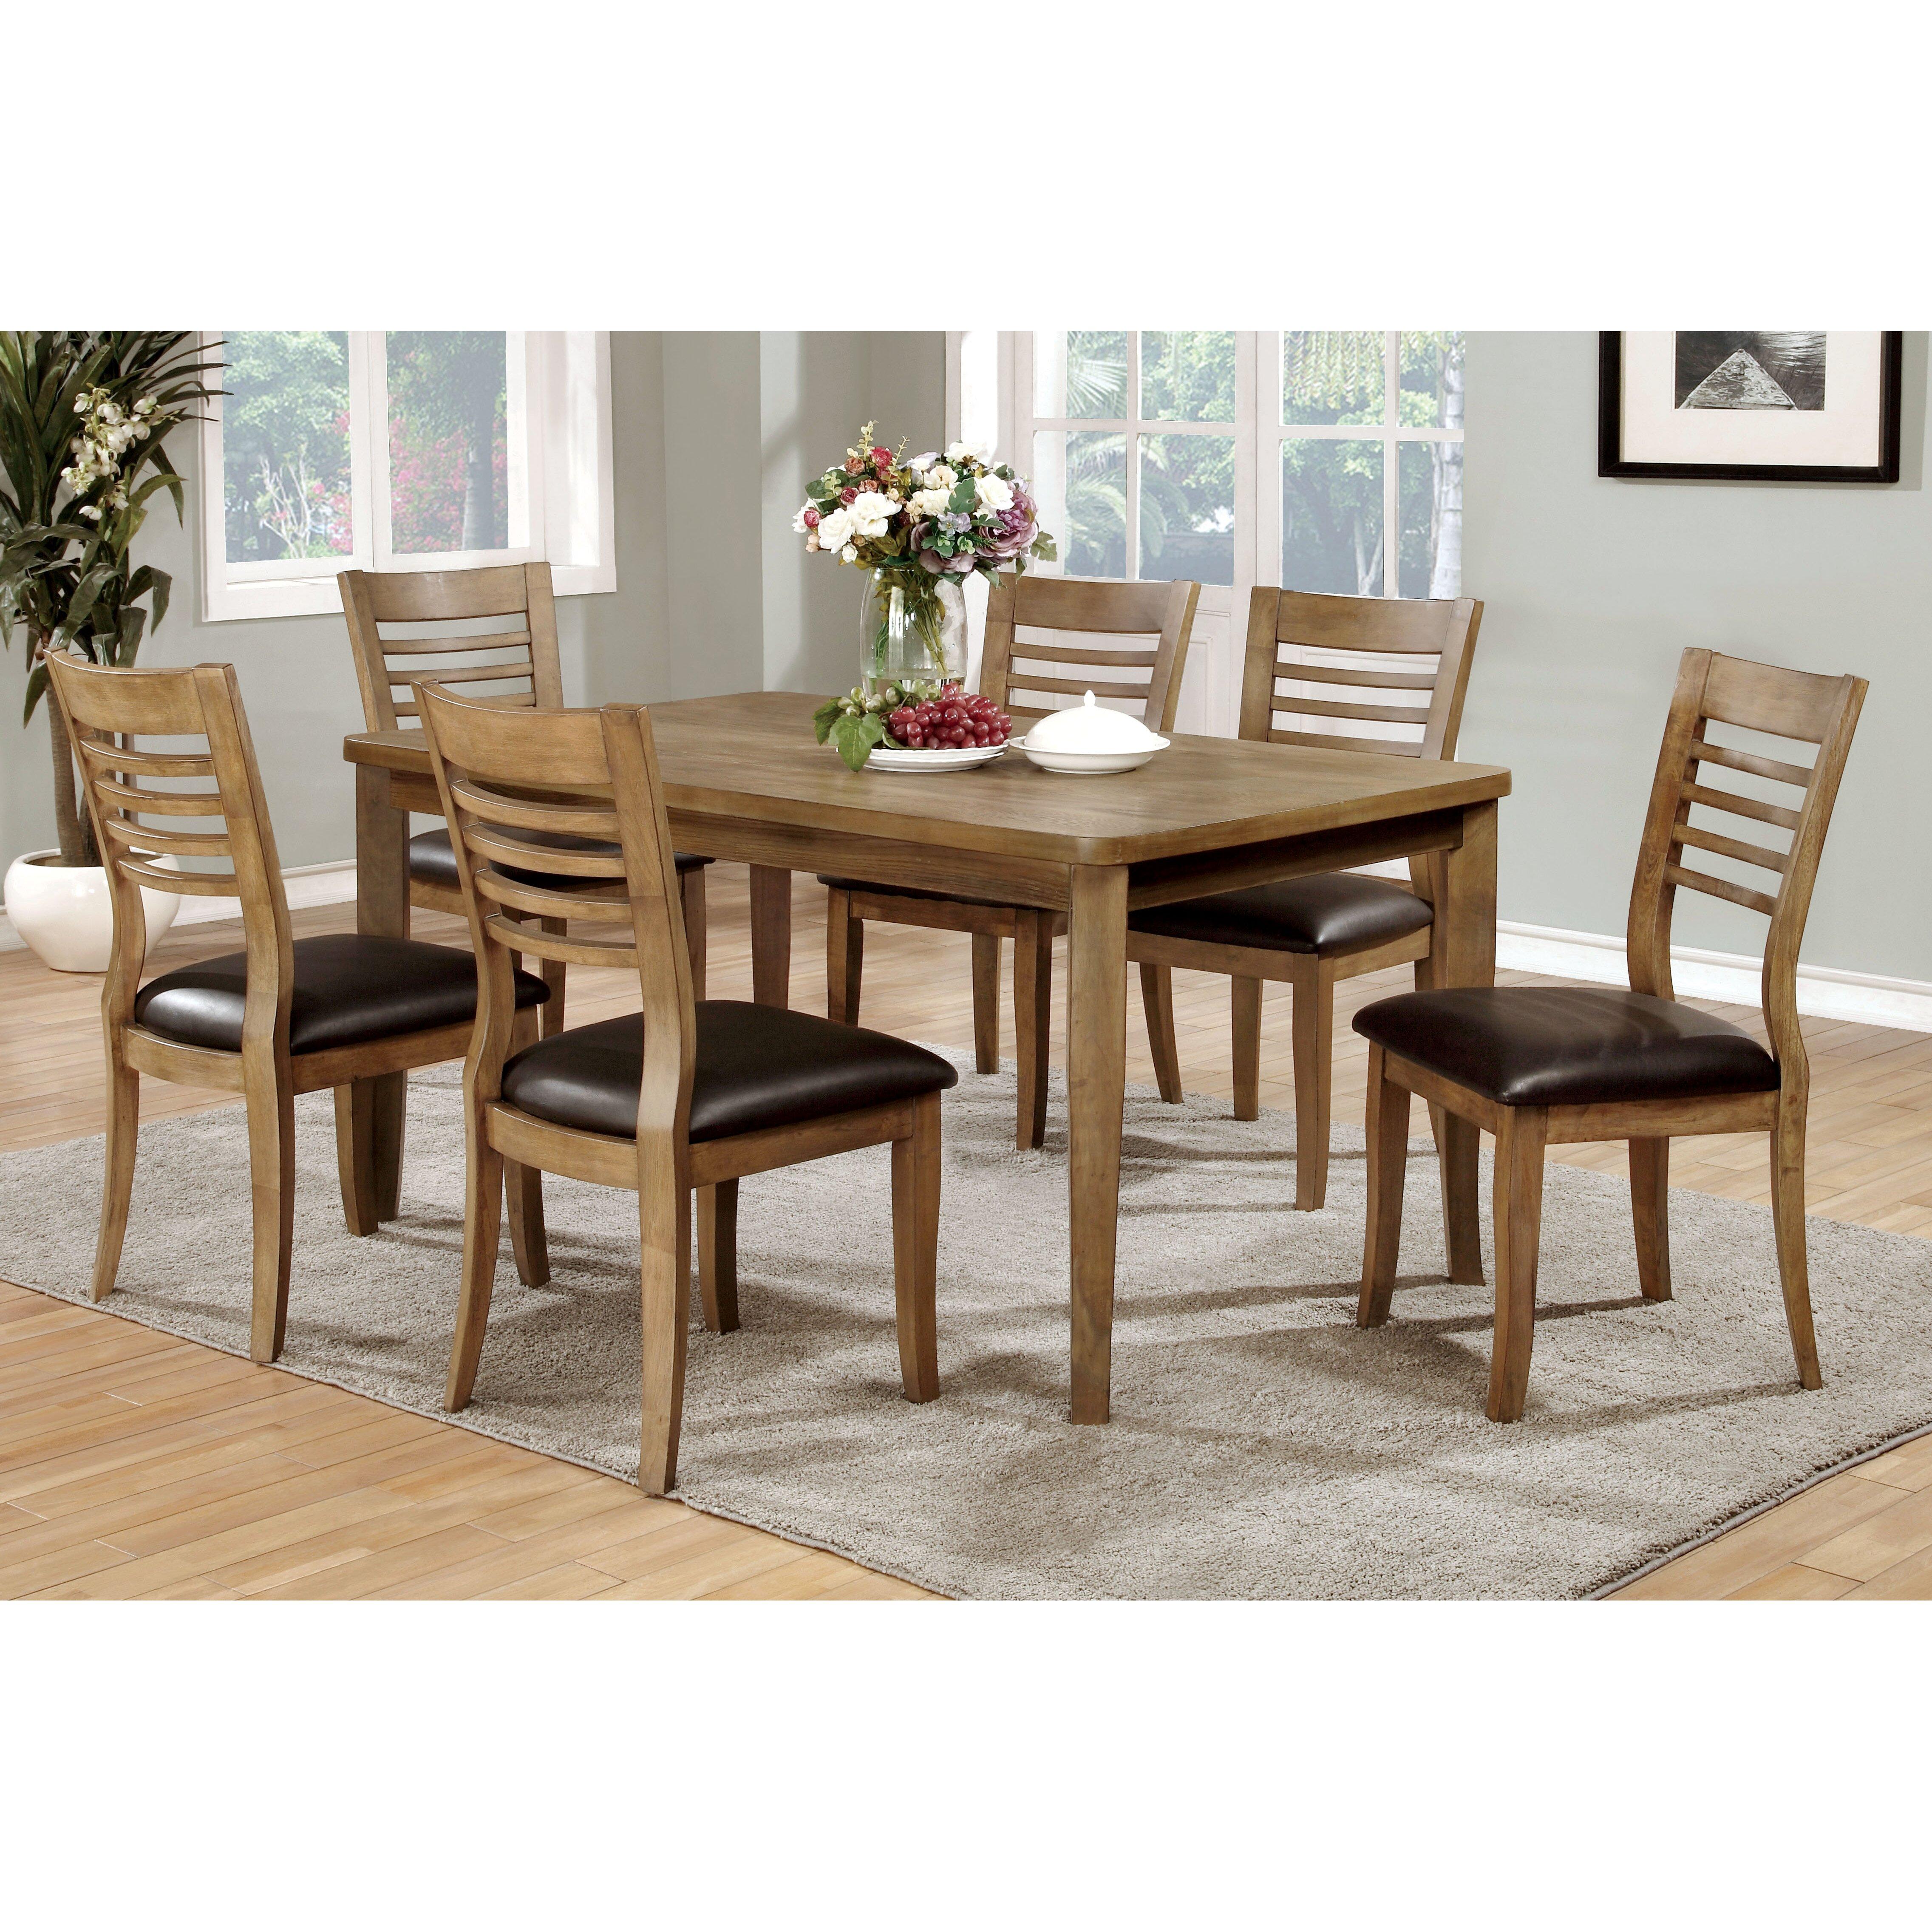 Hokku designs natura 7 piece dining table reviews wayfair for Hokku designs dining room furniture